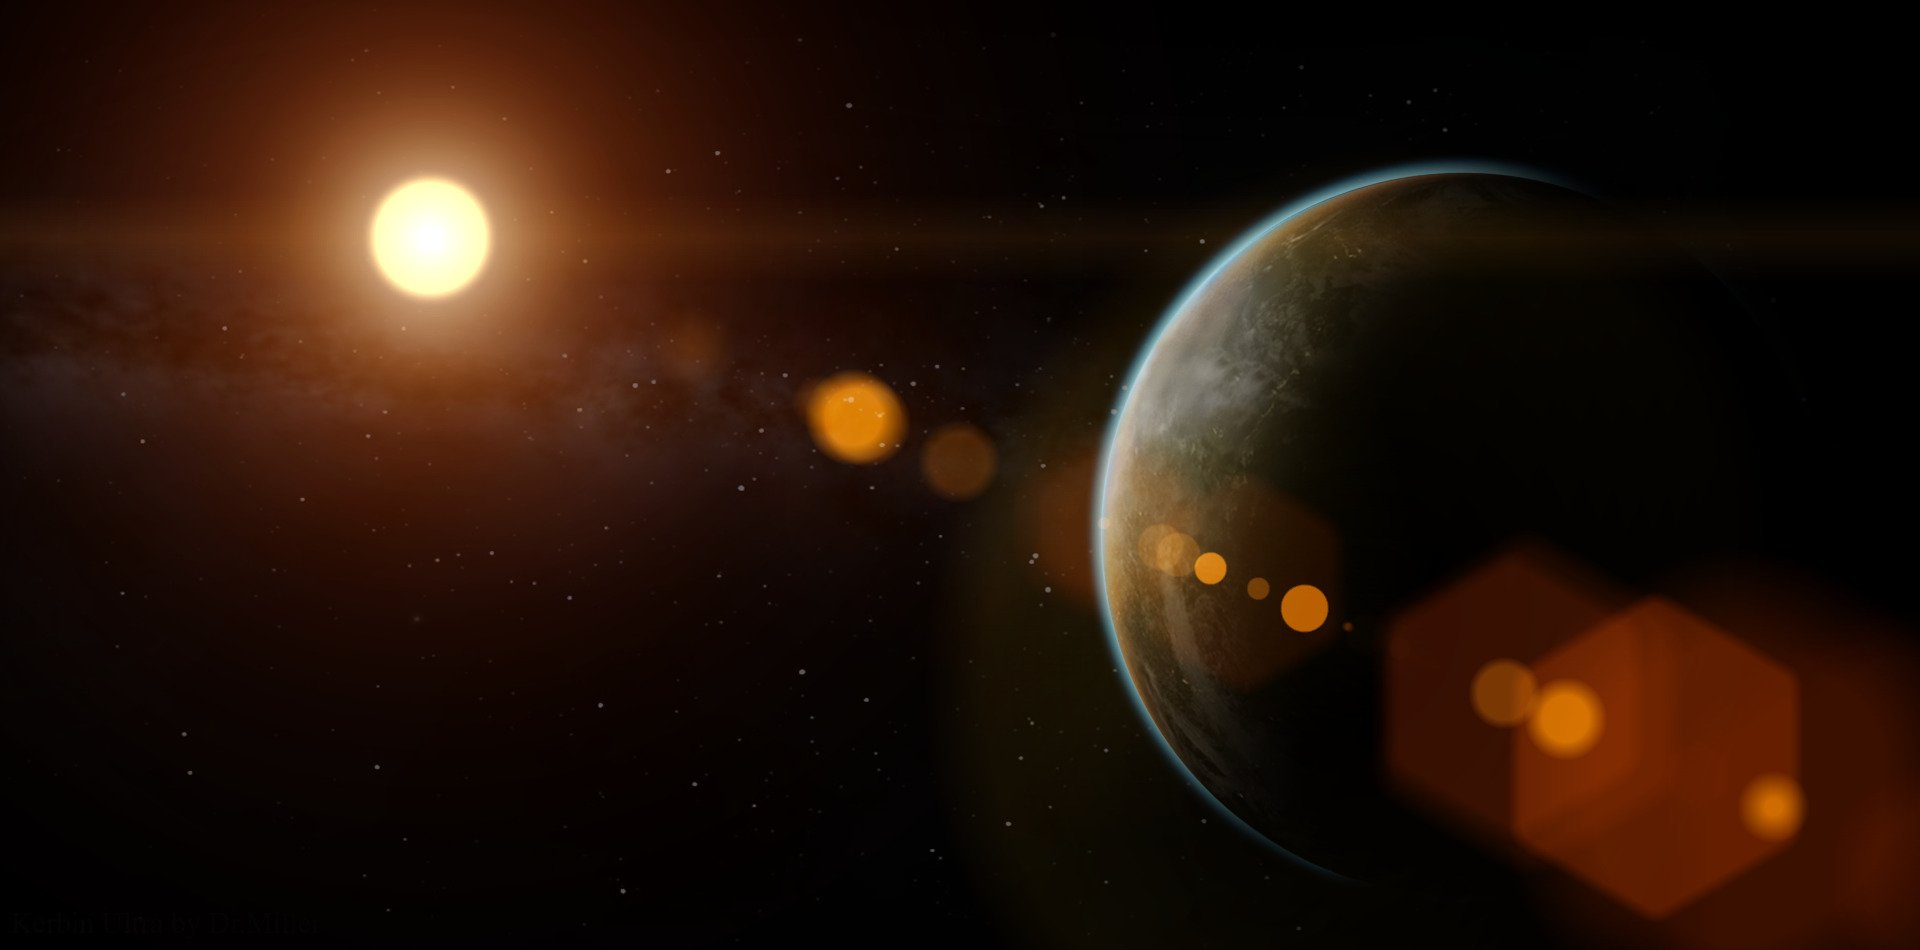 Kerbal space program space earth sun hd wallpapers - Wallpaper kerbal space program ...